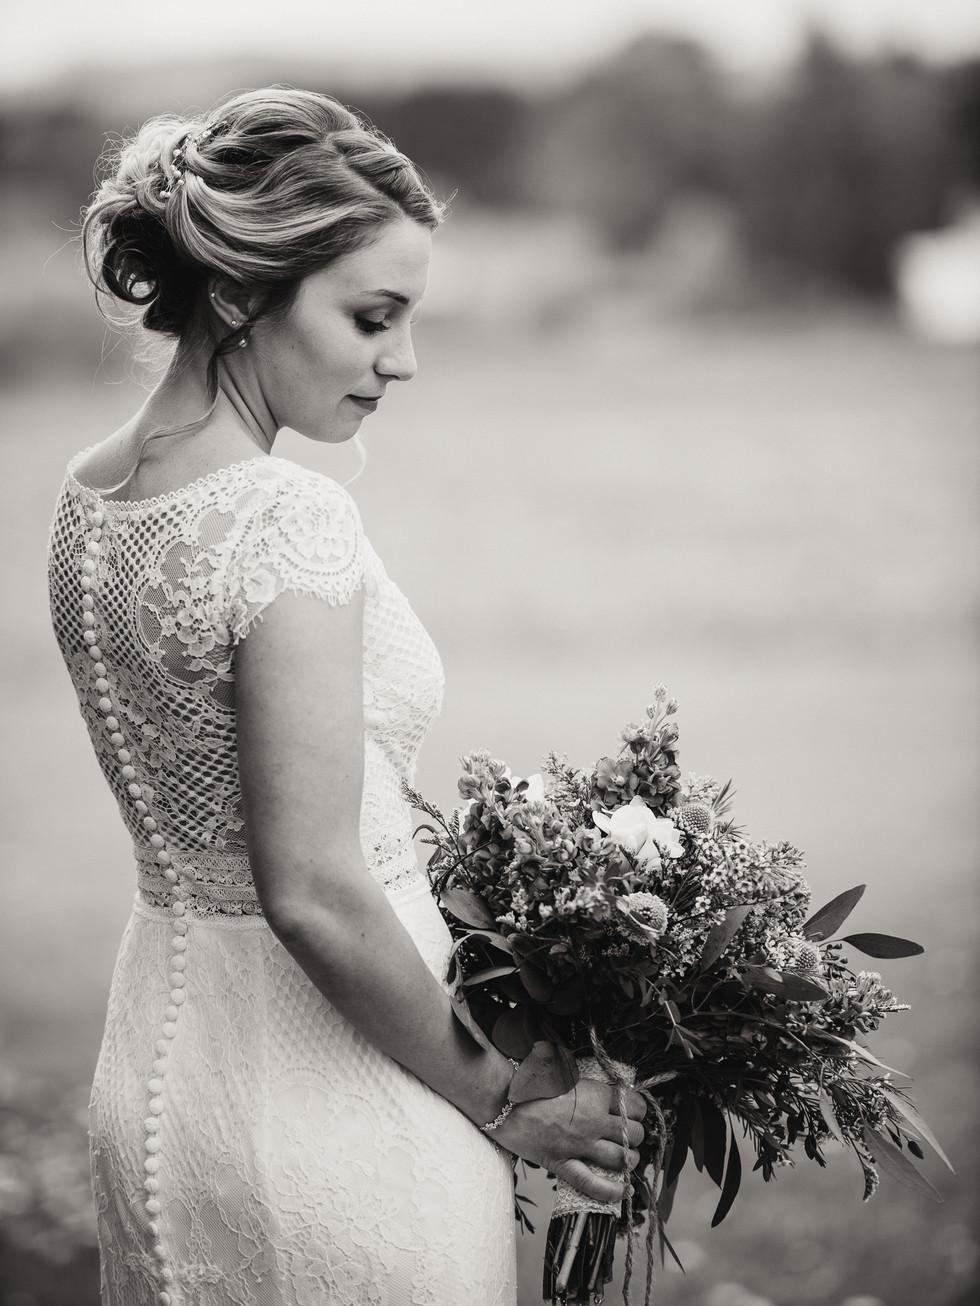 wedding bridal portrait photography rochester ny